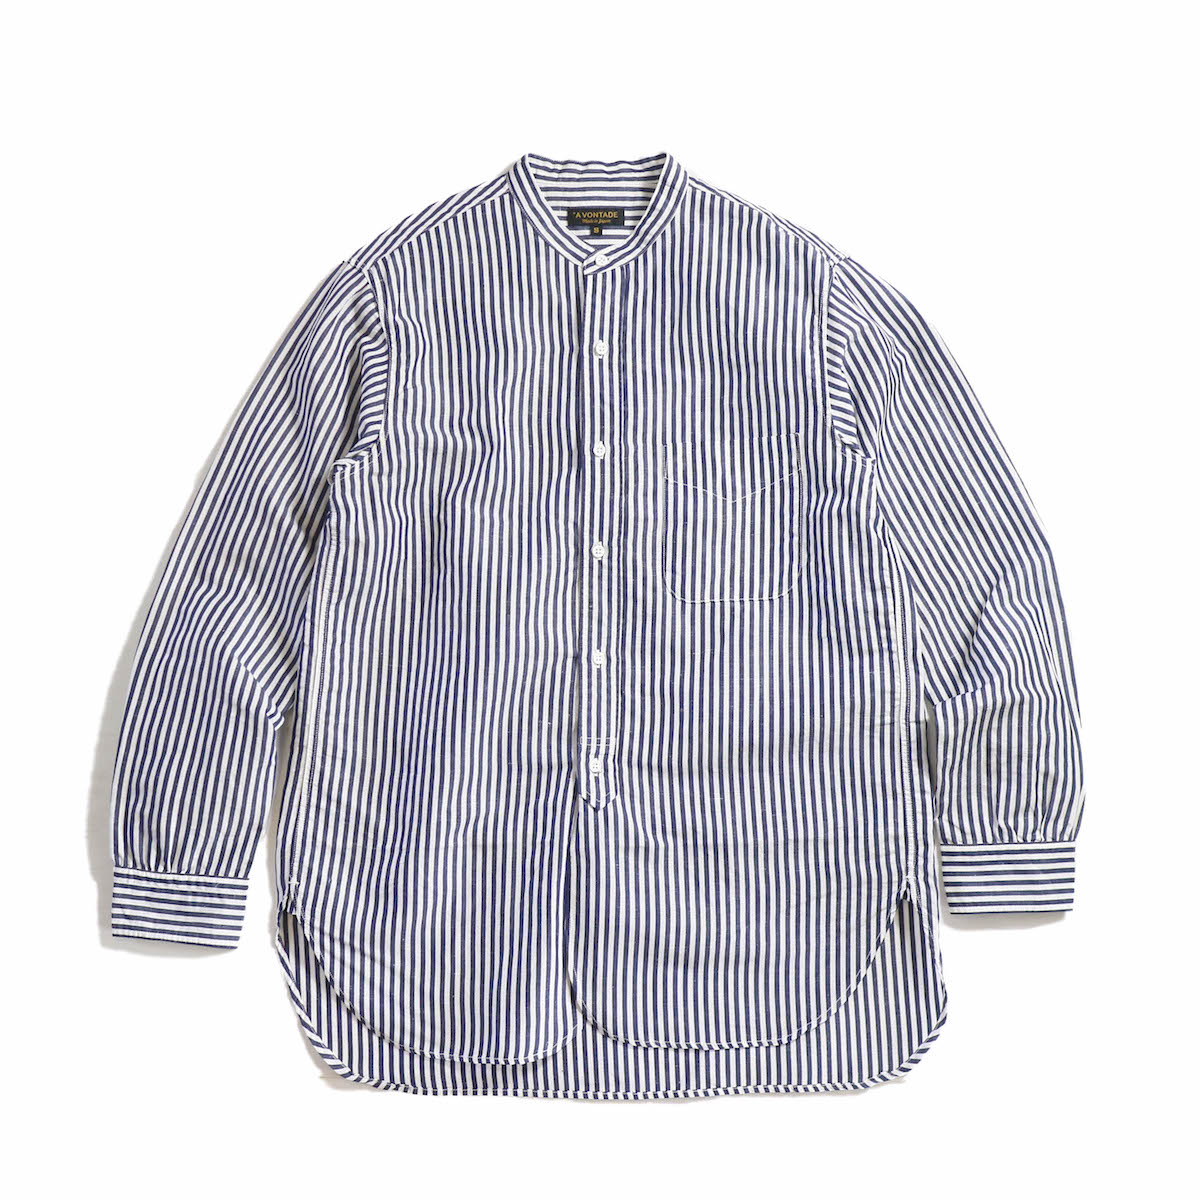 A VONTADE / Banded Collar Shirt -Navy Stripe